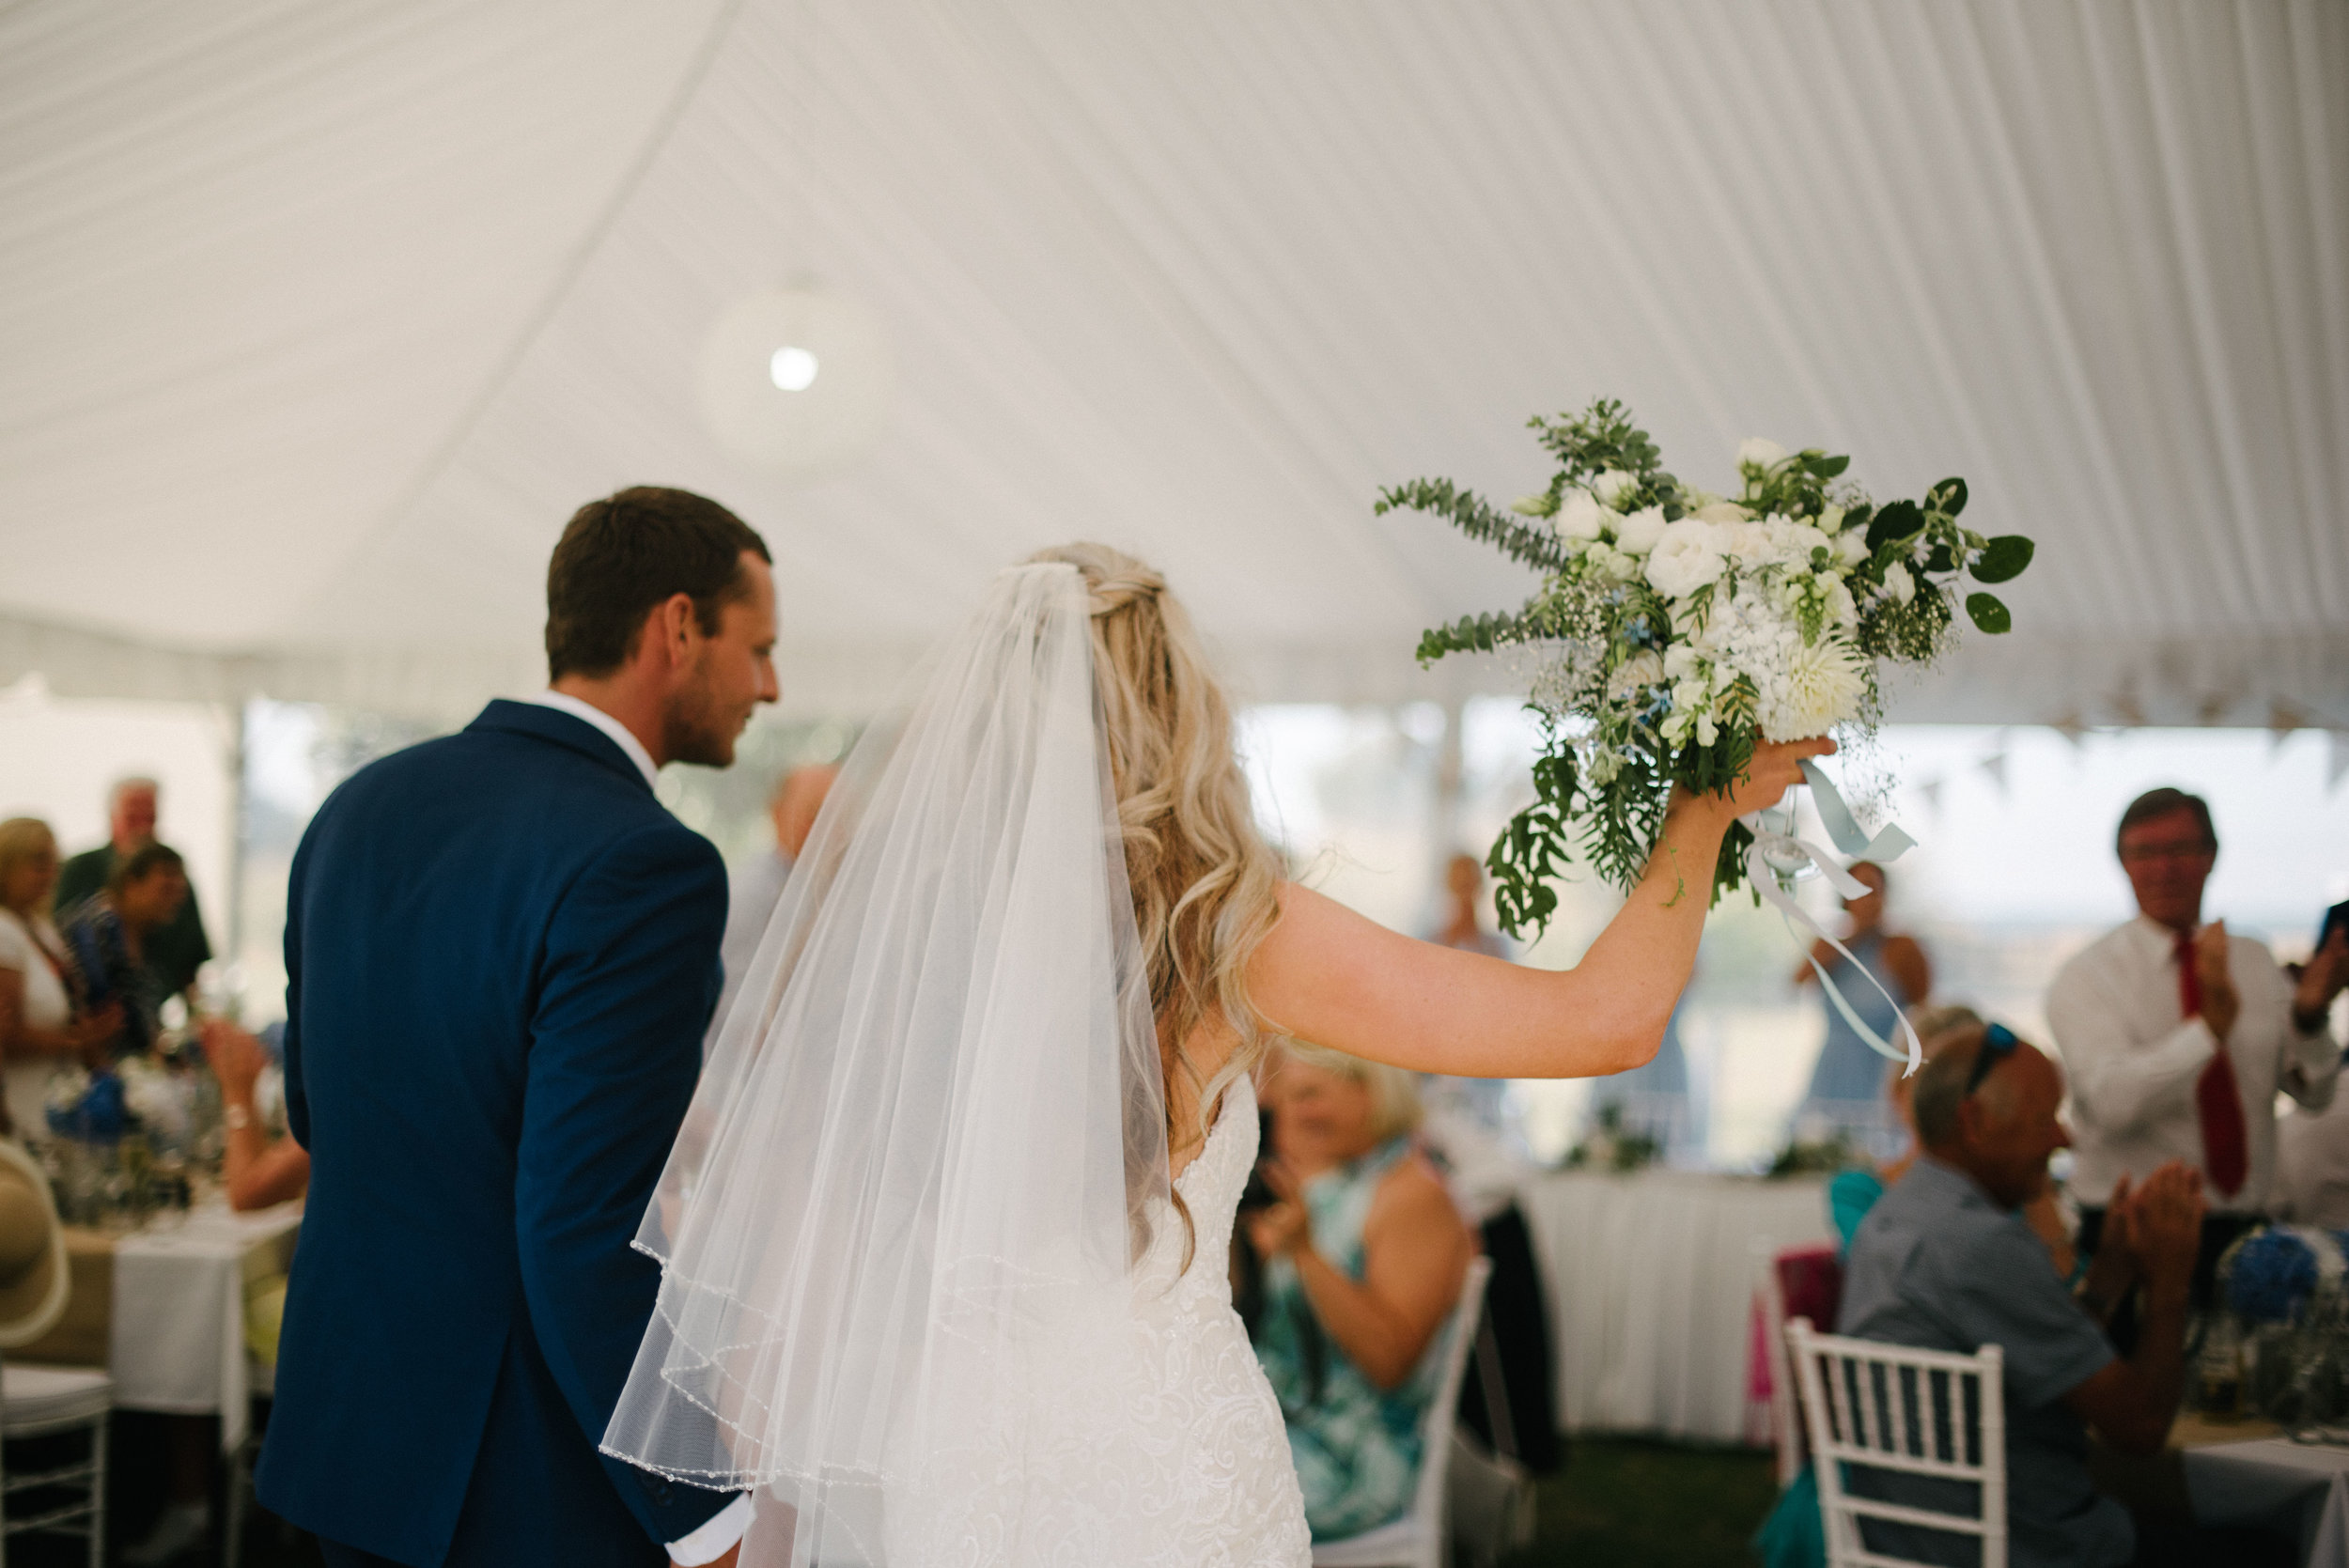 Jolanta-Nick-Wedding-Michael-Schultz-Photography-0674.jpg